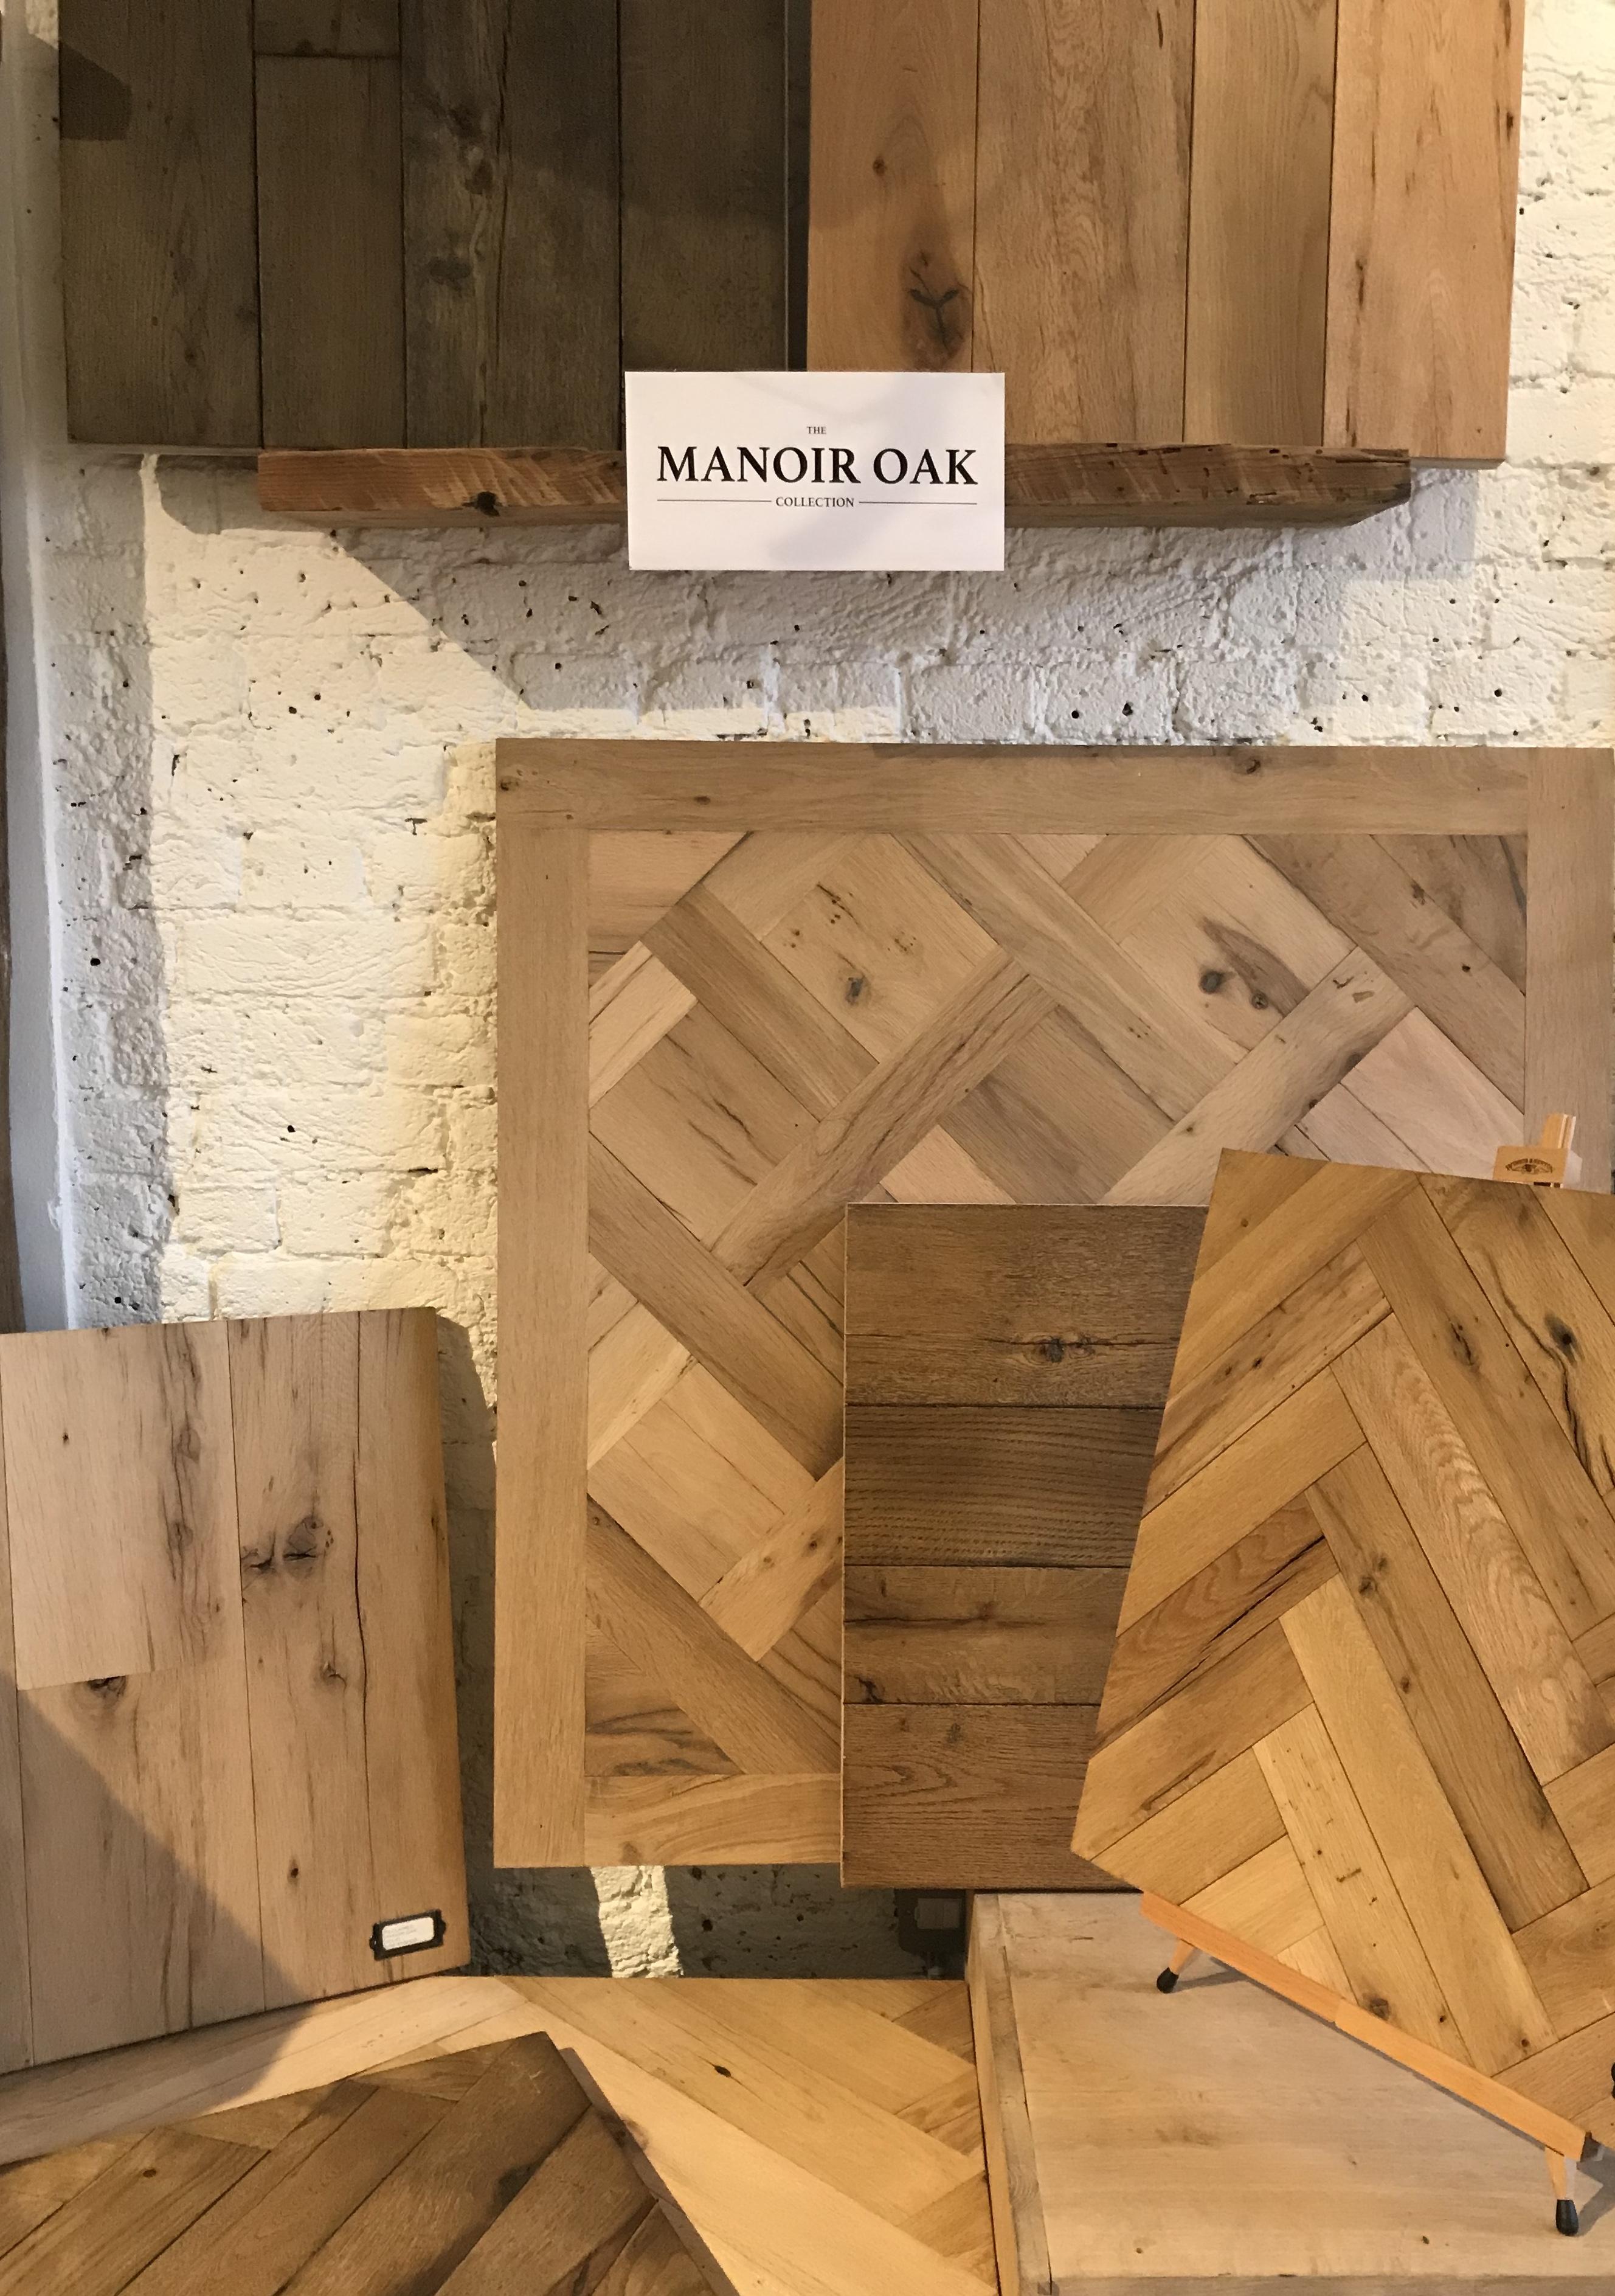 Manoir Oak Collection